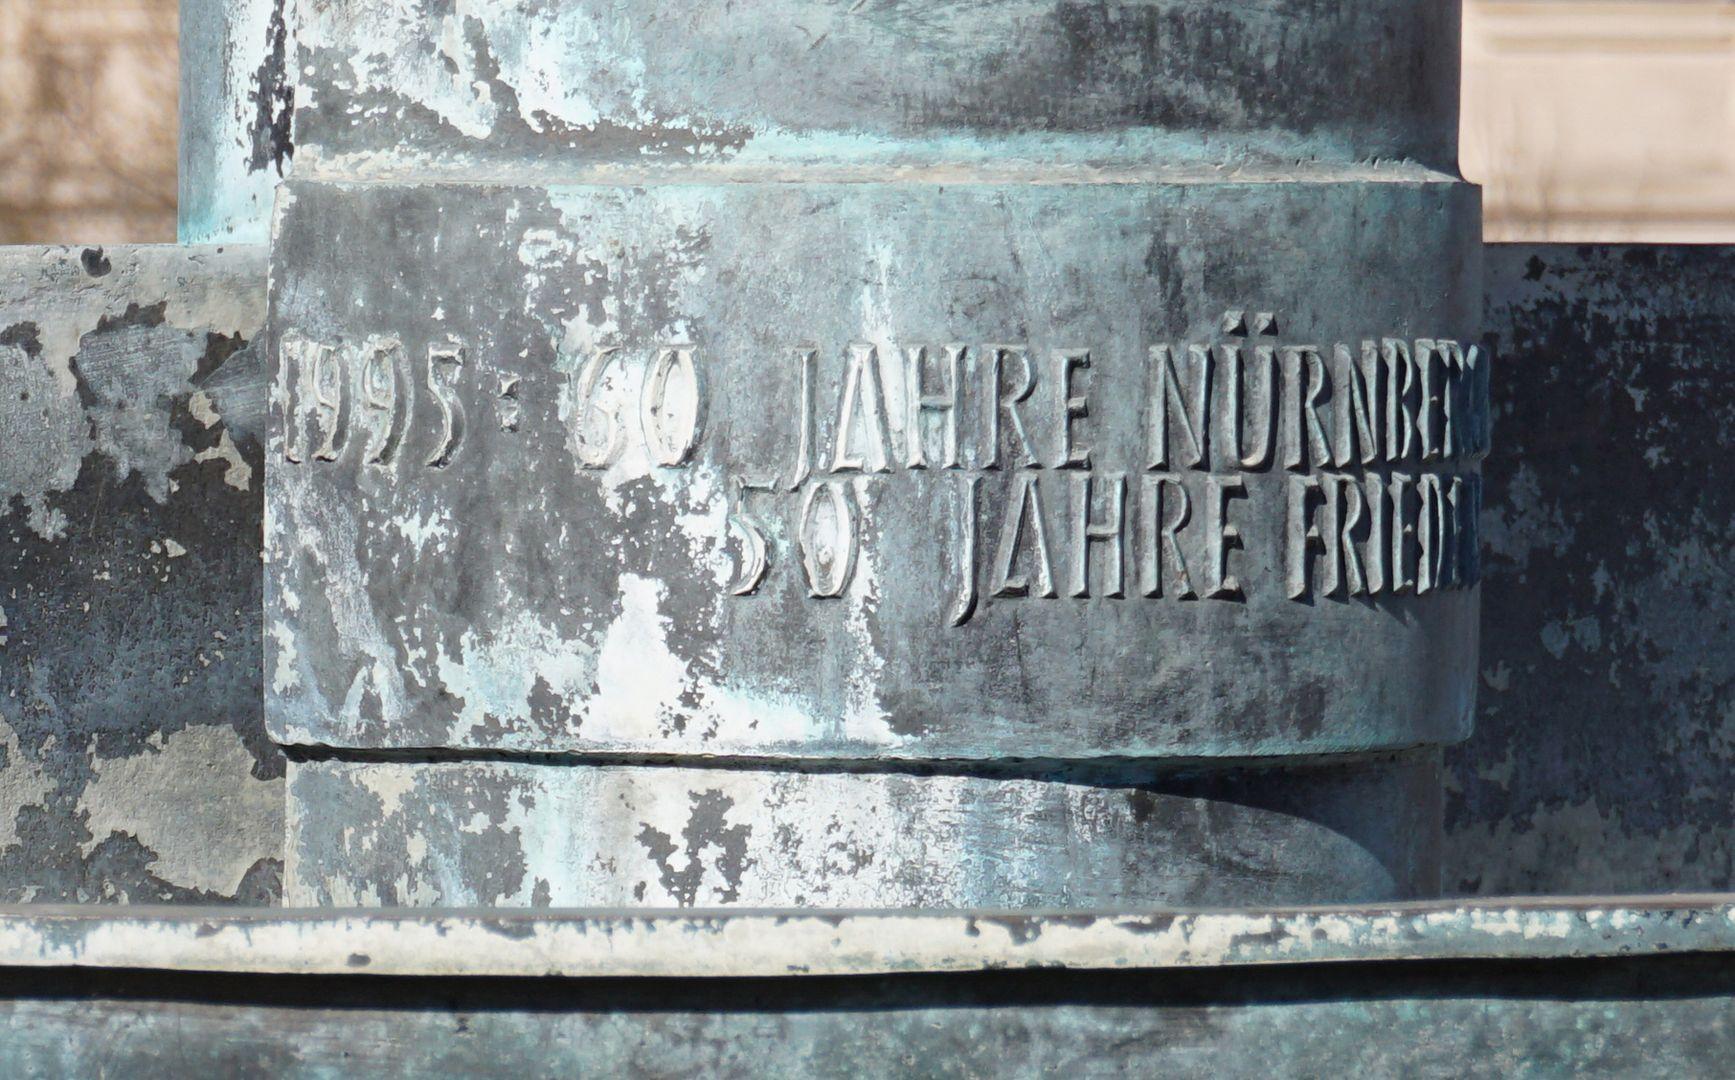 Norisbrunnen Inschrift an der unteren Brunnenschale: 1995: 60 Jahre Nürnberger Gesetze / 50 Jahre Frieden